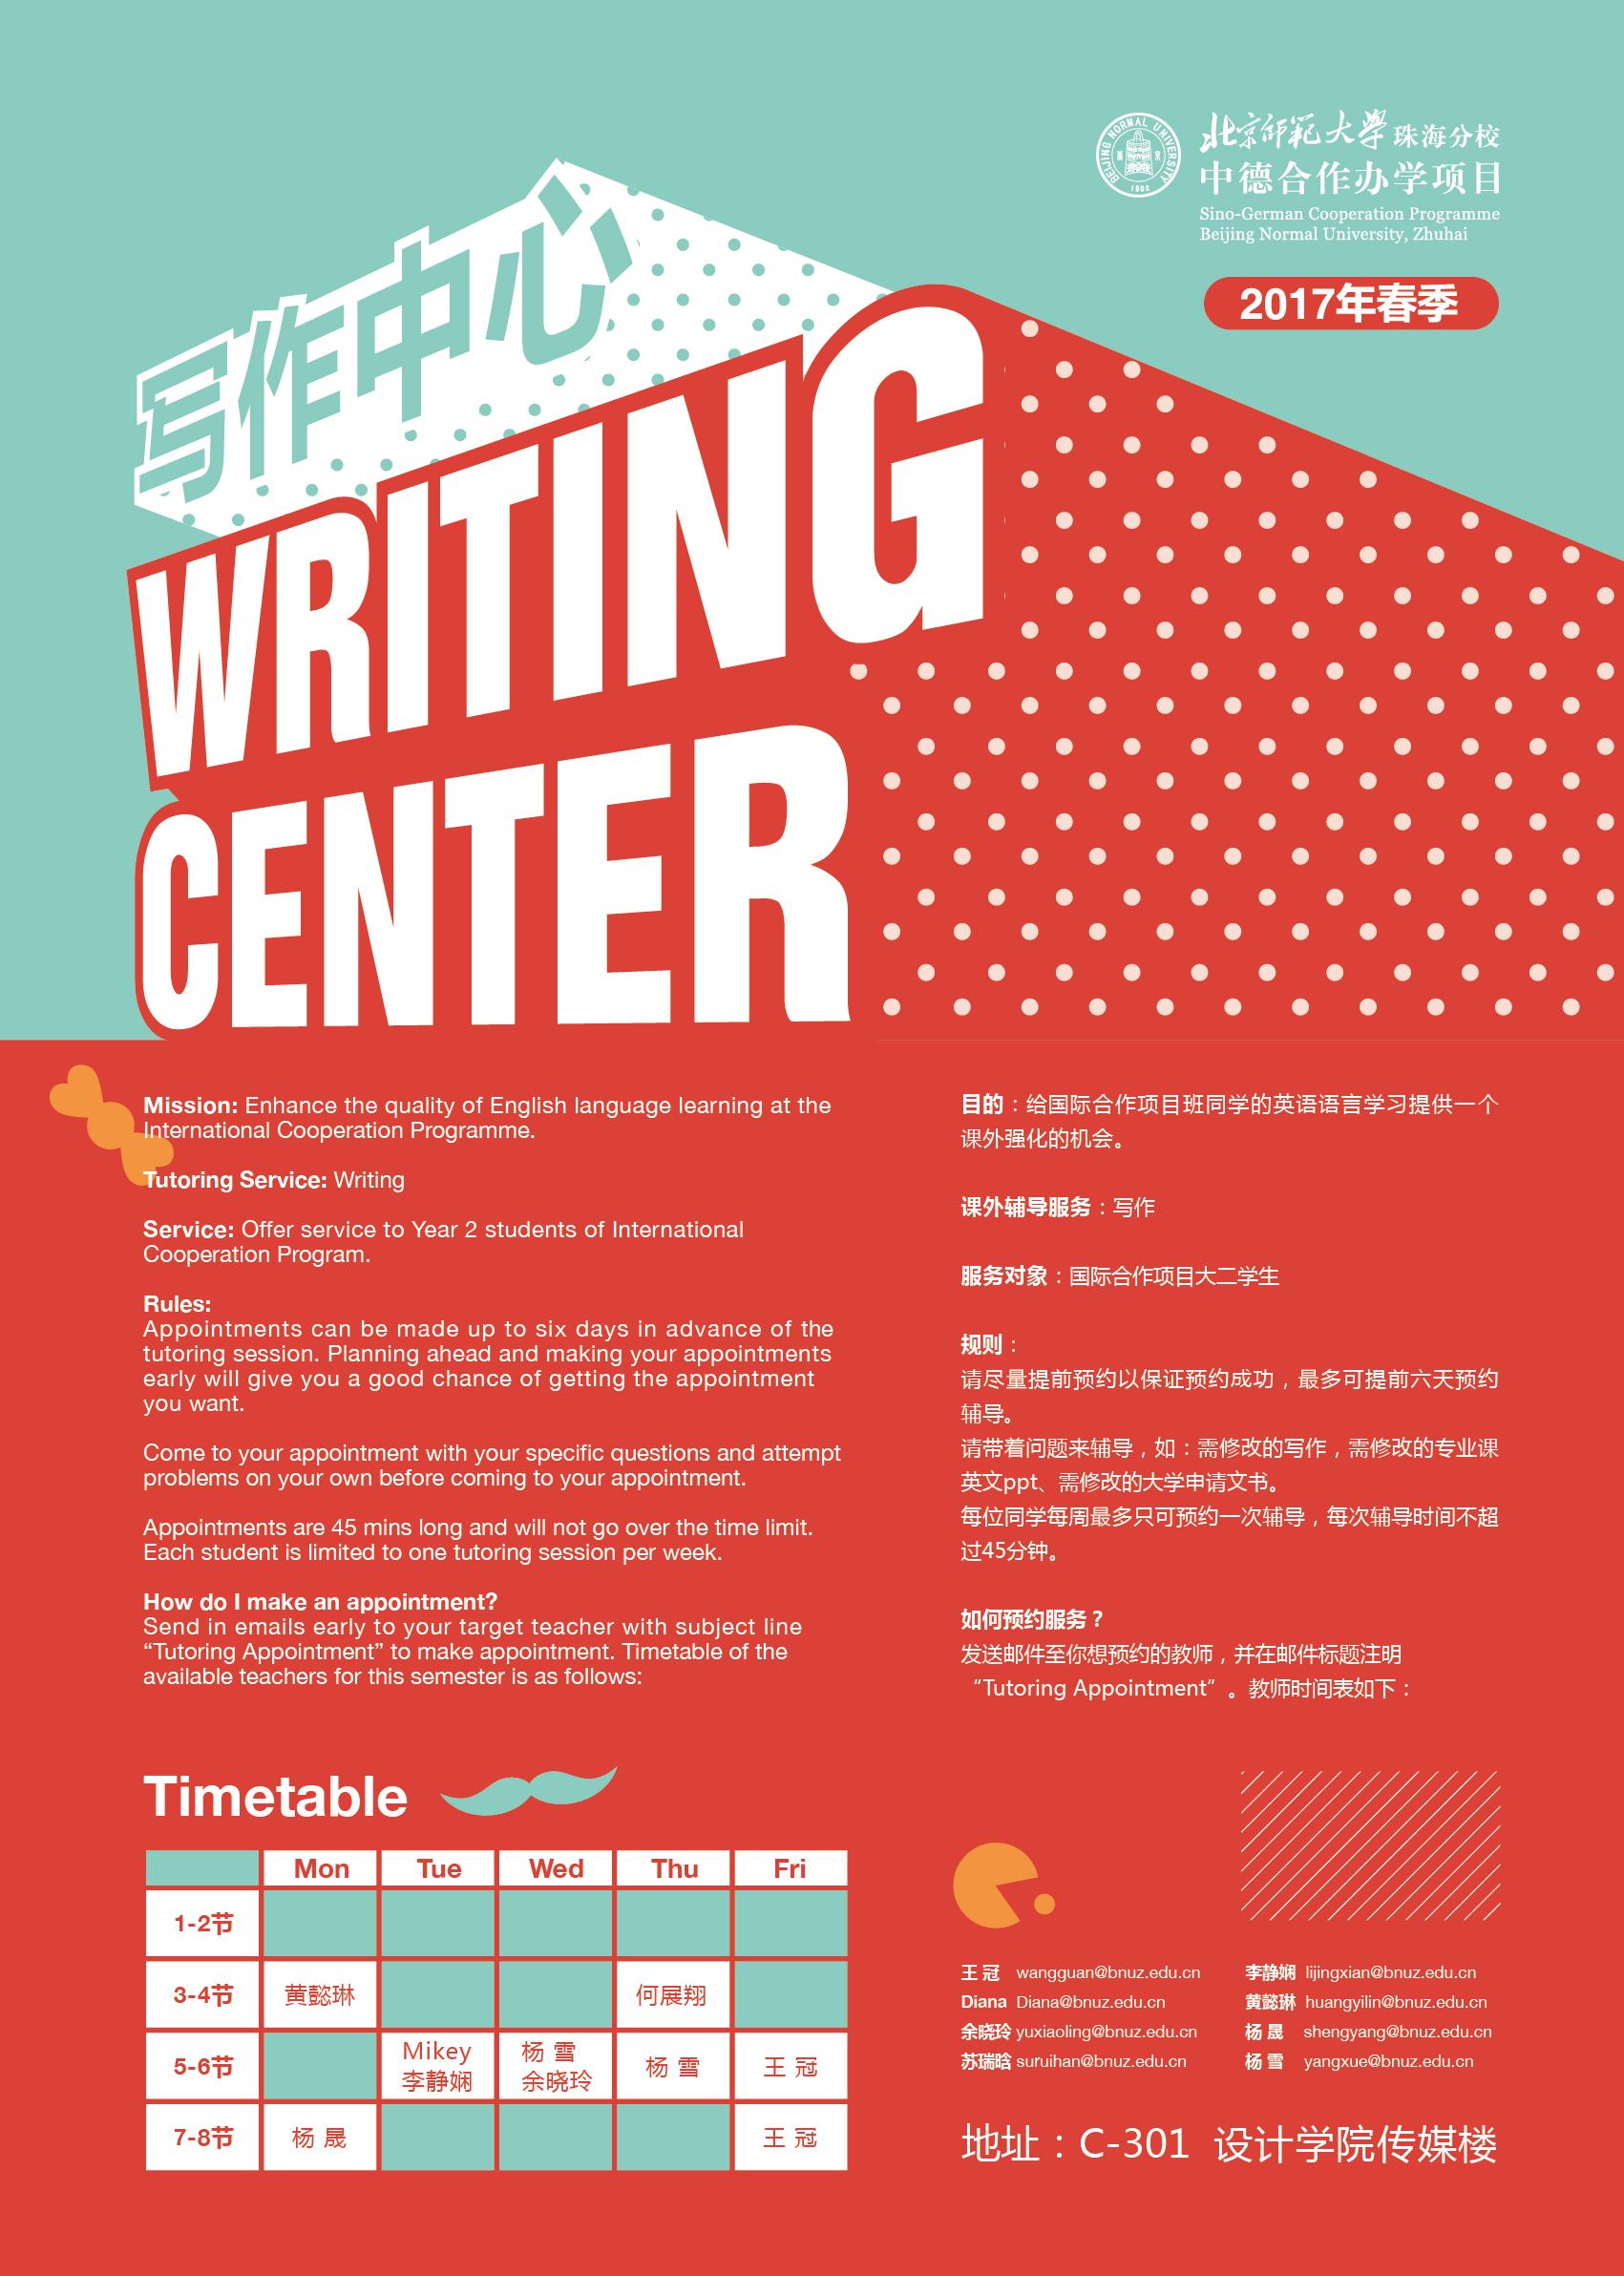 writing center newsletter The writing center wire v o l u m e 1 , i s s u e 1 i i m a y 2 0 1 1 points of interest: grammar gab text talk pronoun use wa alumni.